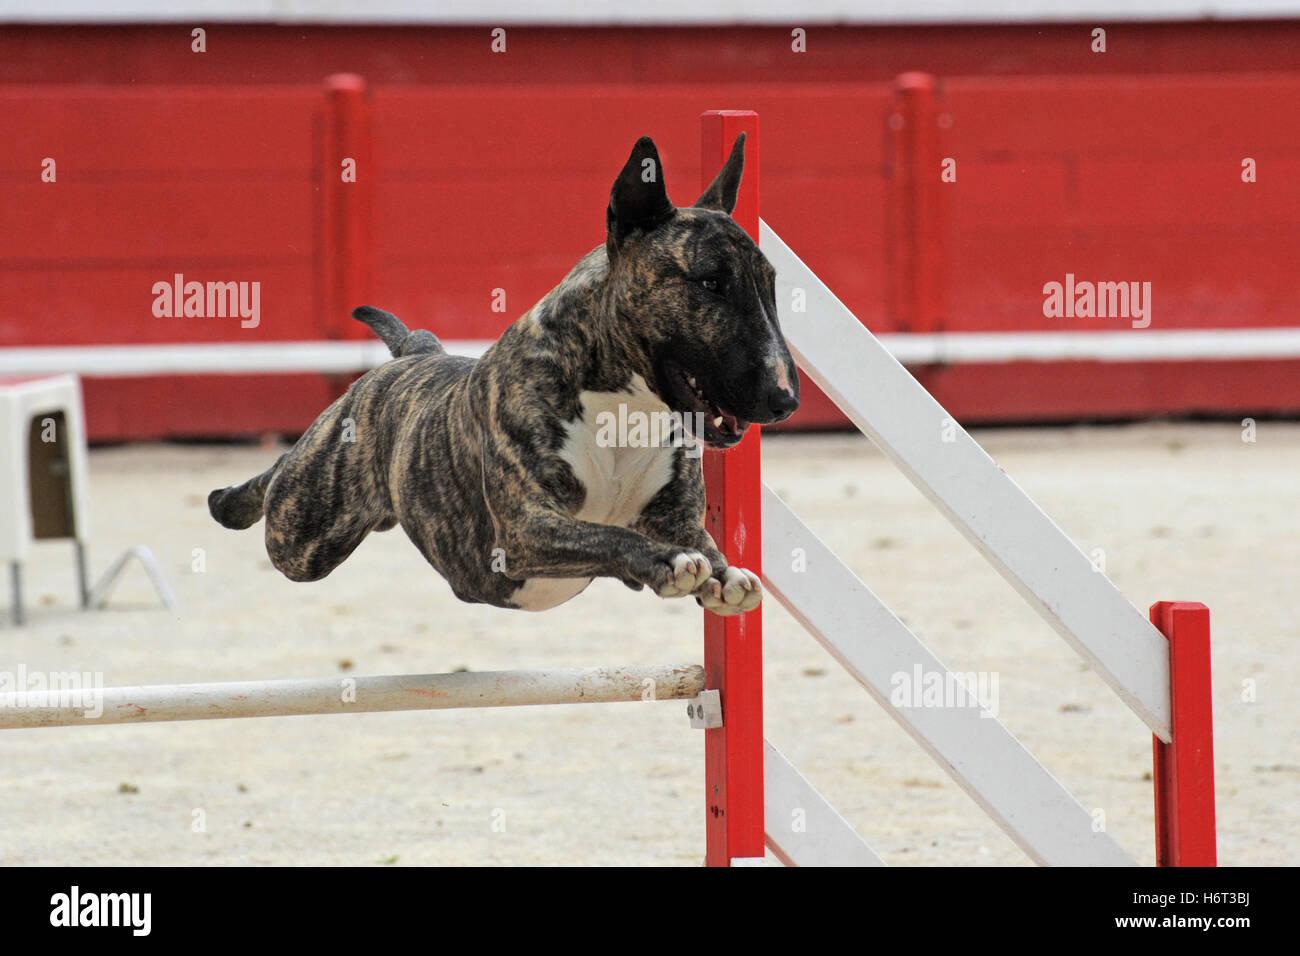 dog spring bouncing bounces hop skipping frisks jumping jump agility sport sports run running runs motion postponement - Stock Image